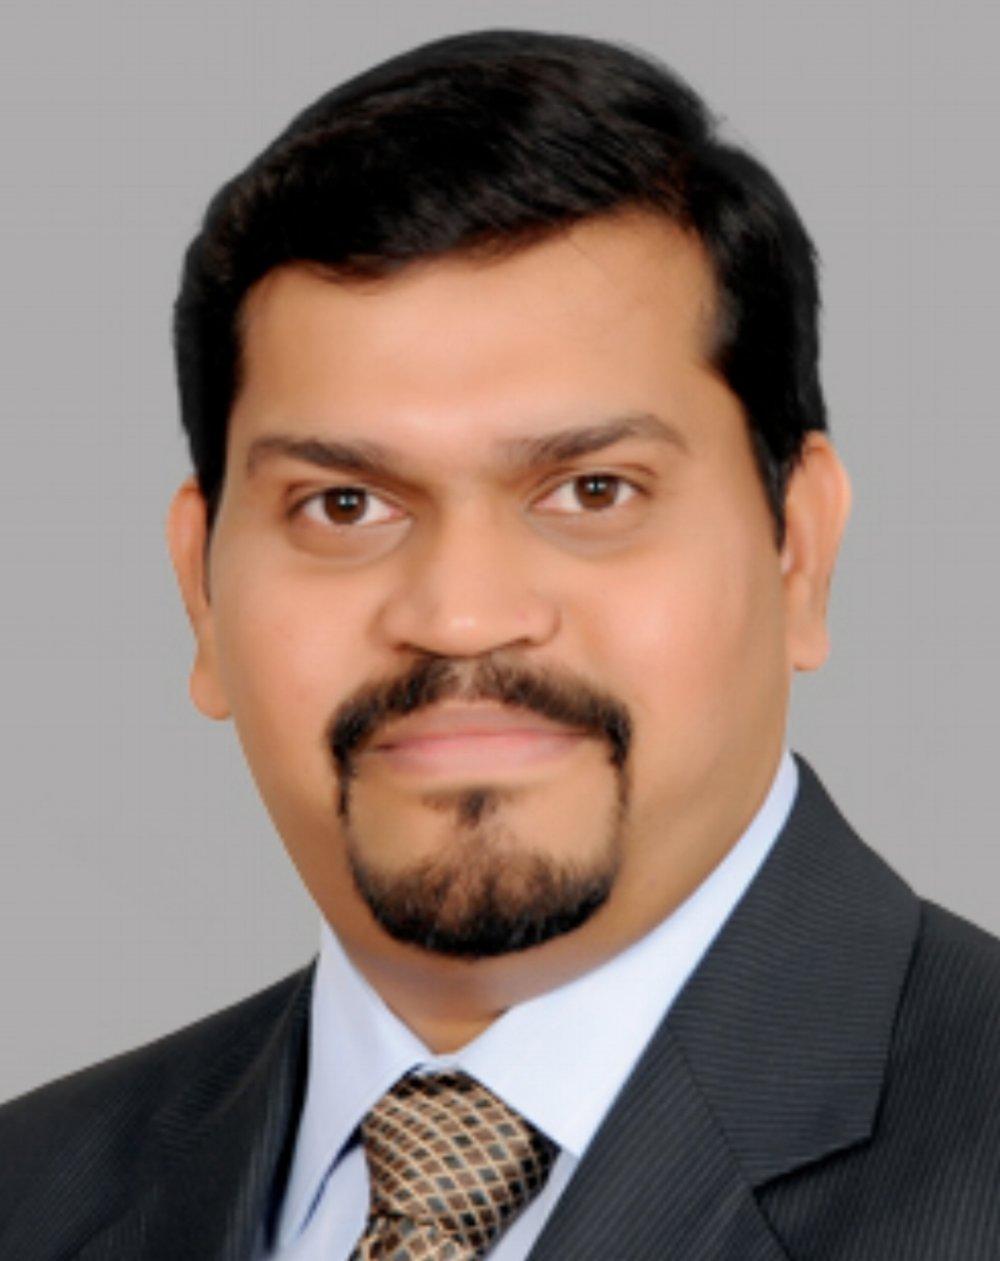 "<p><strong>Lokesh Chandrasekar</strong><a href=""/profile-lokesh""></a></p>"